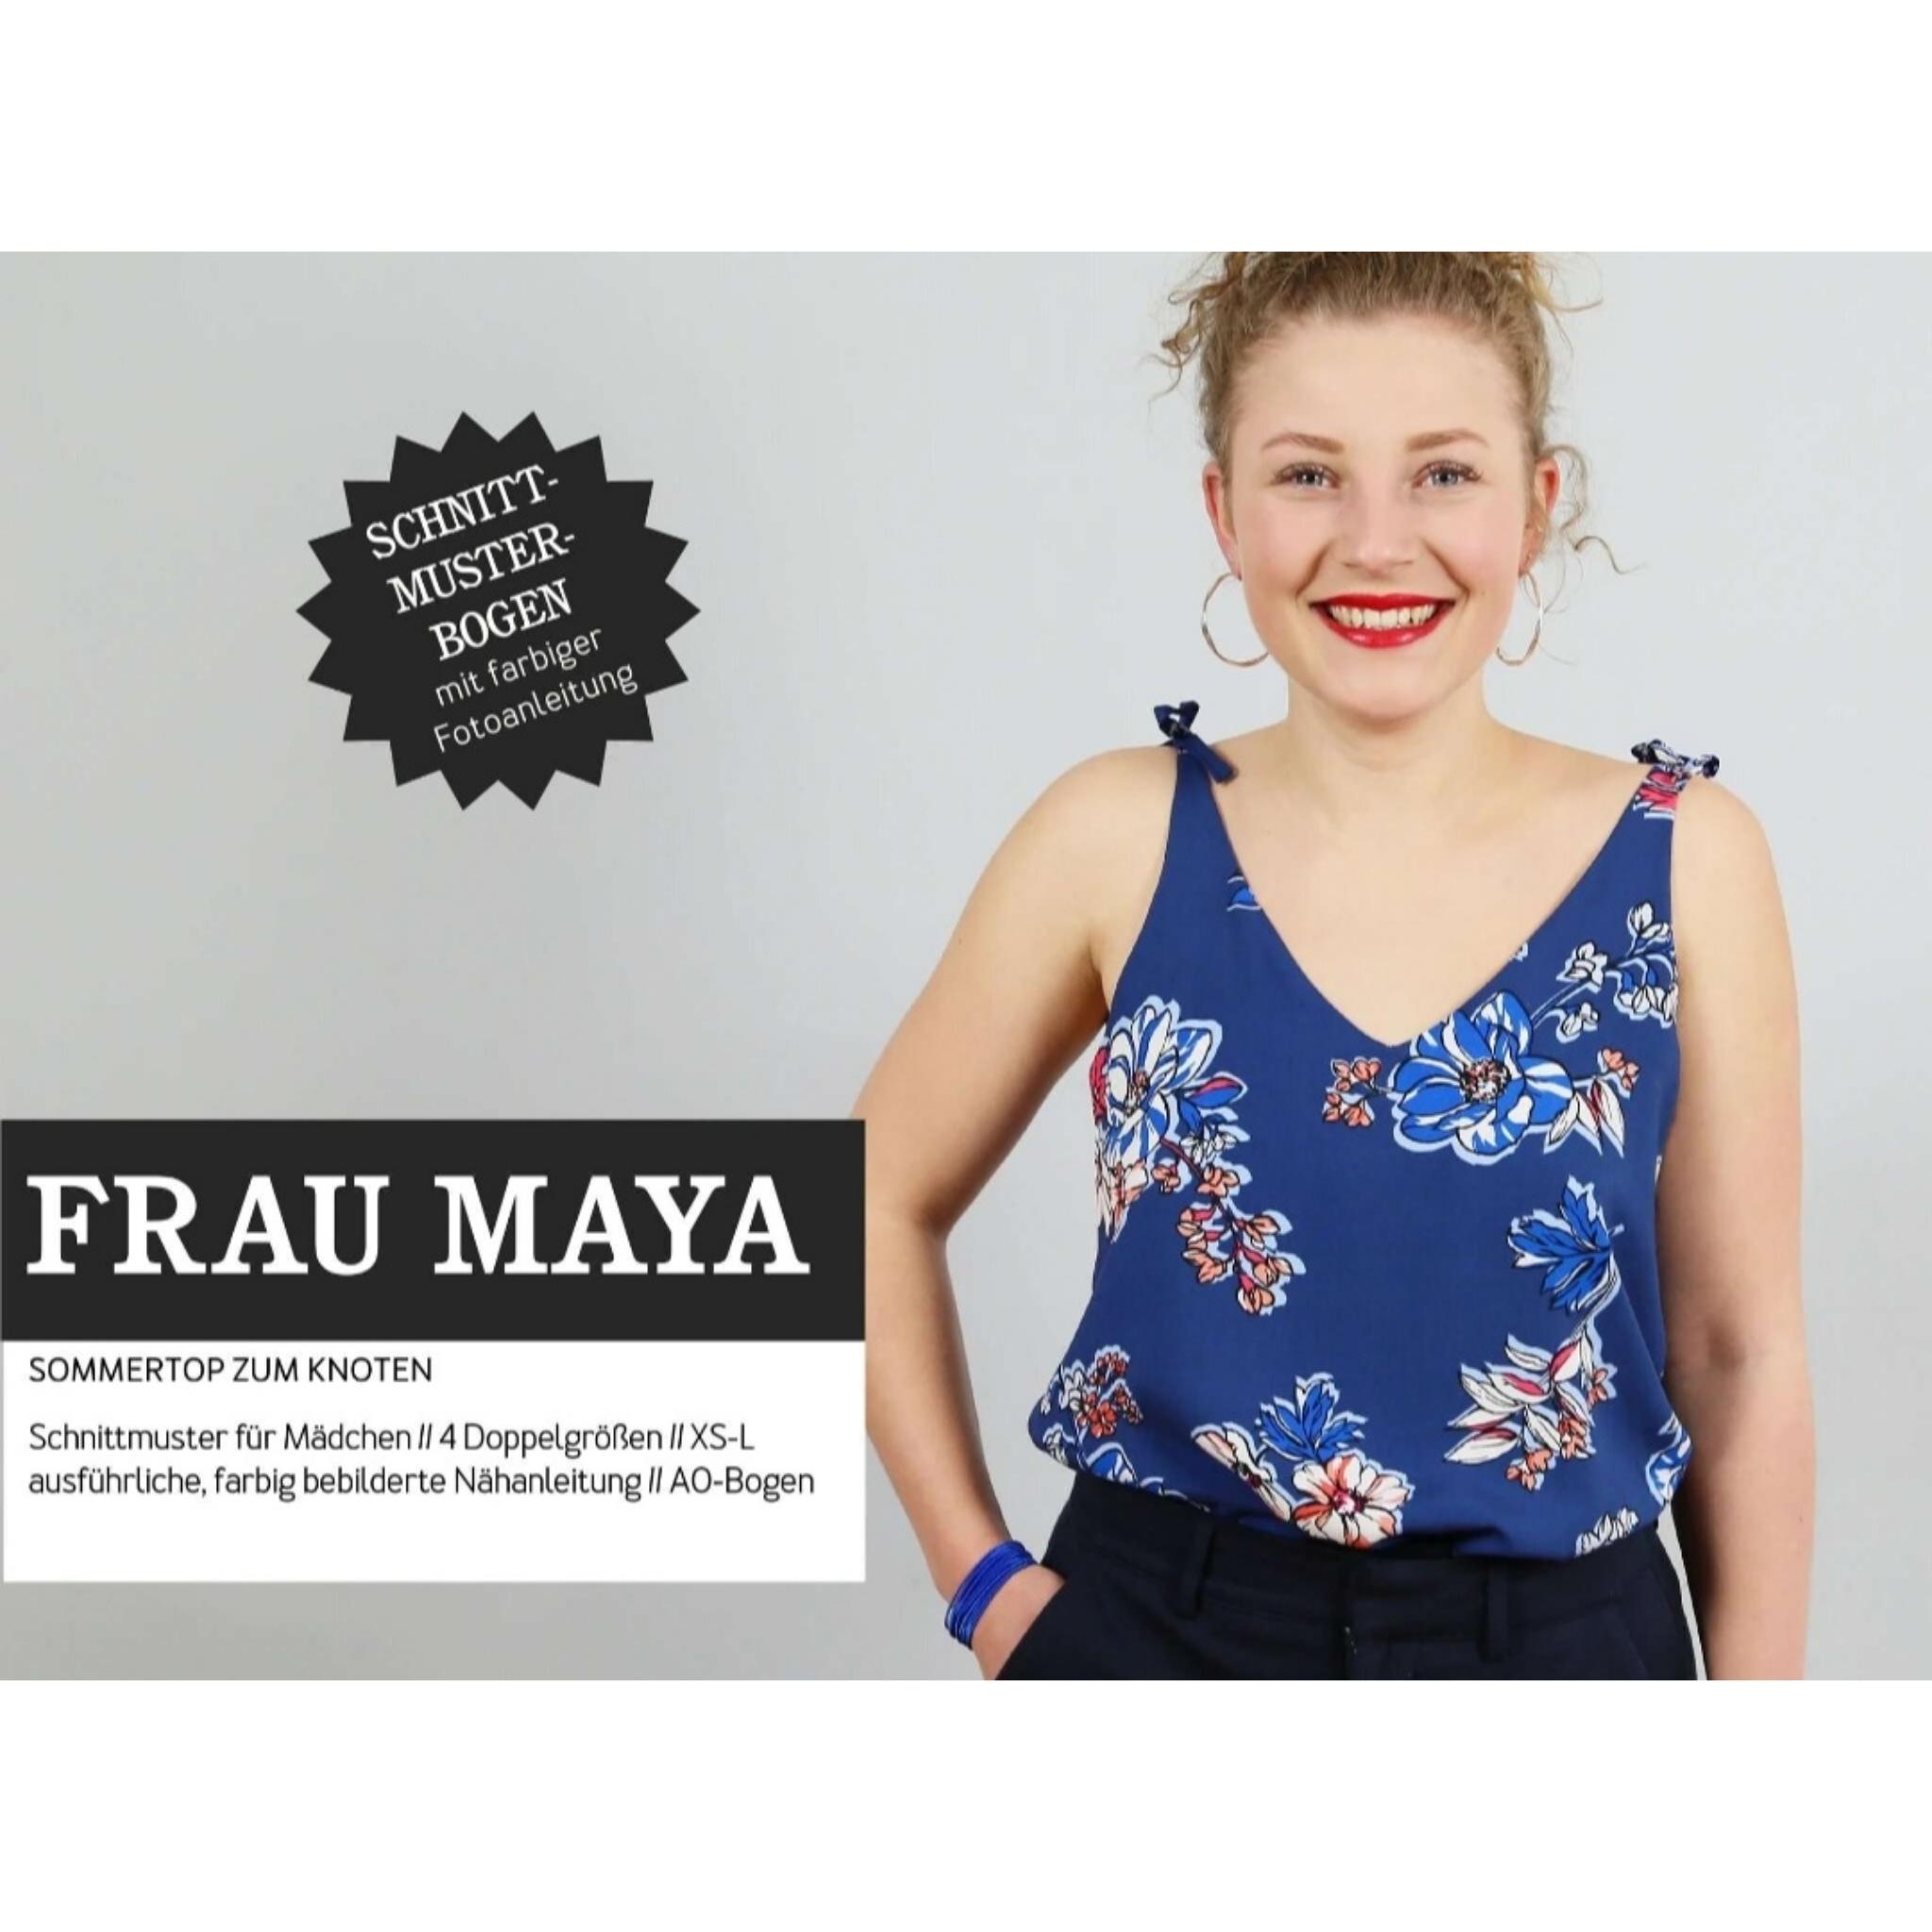 FRAU MAYA schnittmuster studio schnittreif